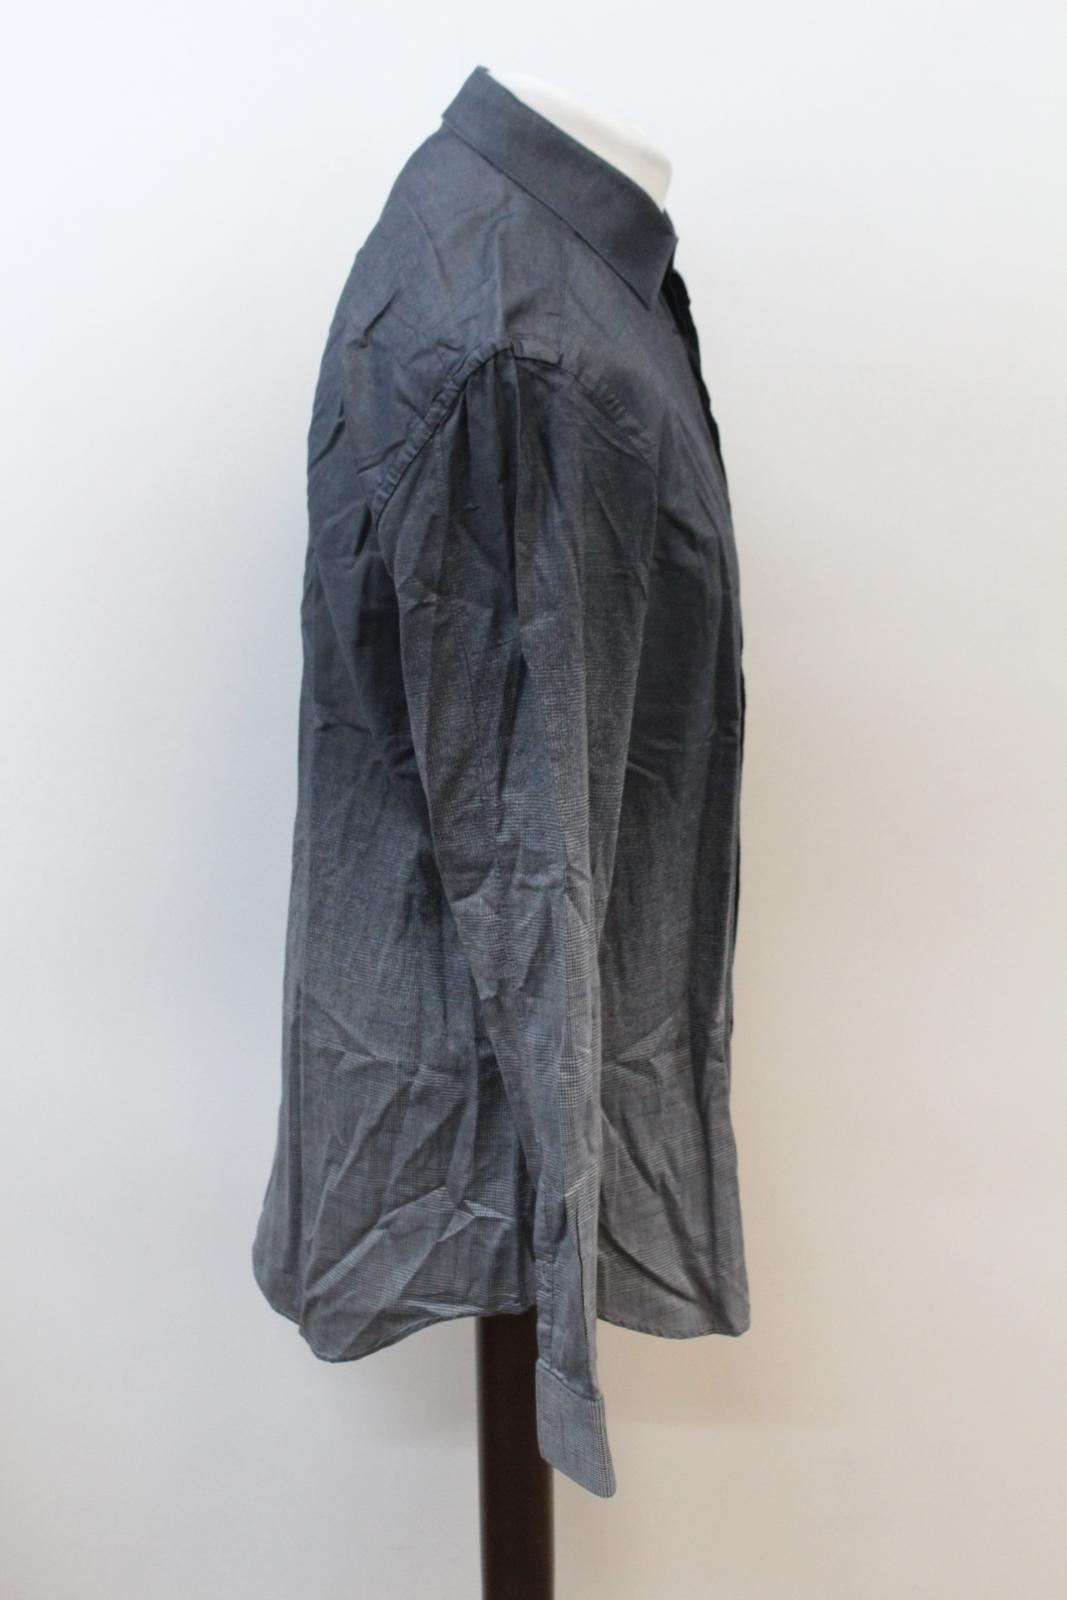 Neil-Barrett-Hombre-Luz-Gris-Oscuro-Algodon-Slim-Fit-Camisa-Cuello-Ombre-16-5-034-42cm miniatura 4